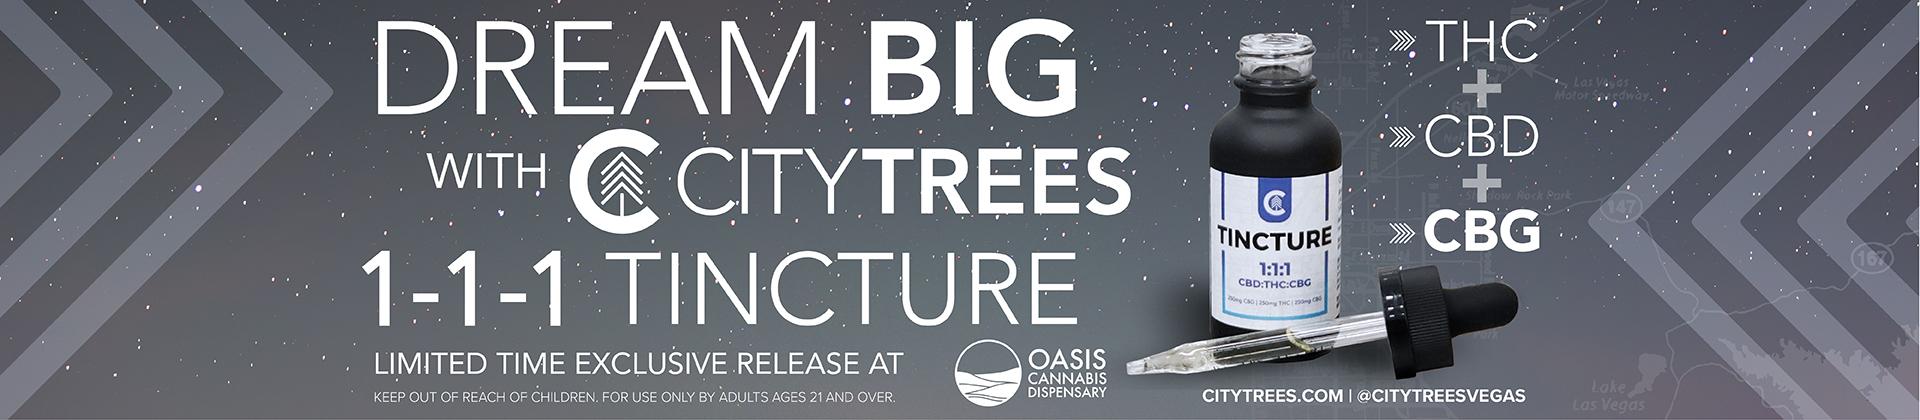 CityTrees 1-1-1 Promo